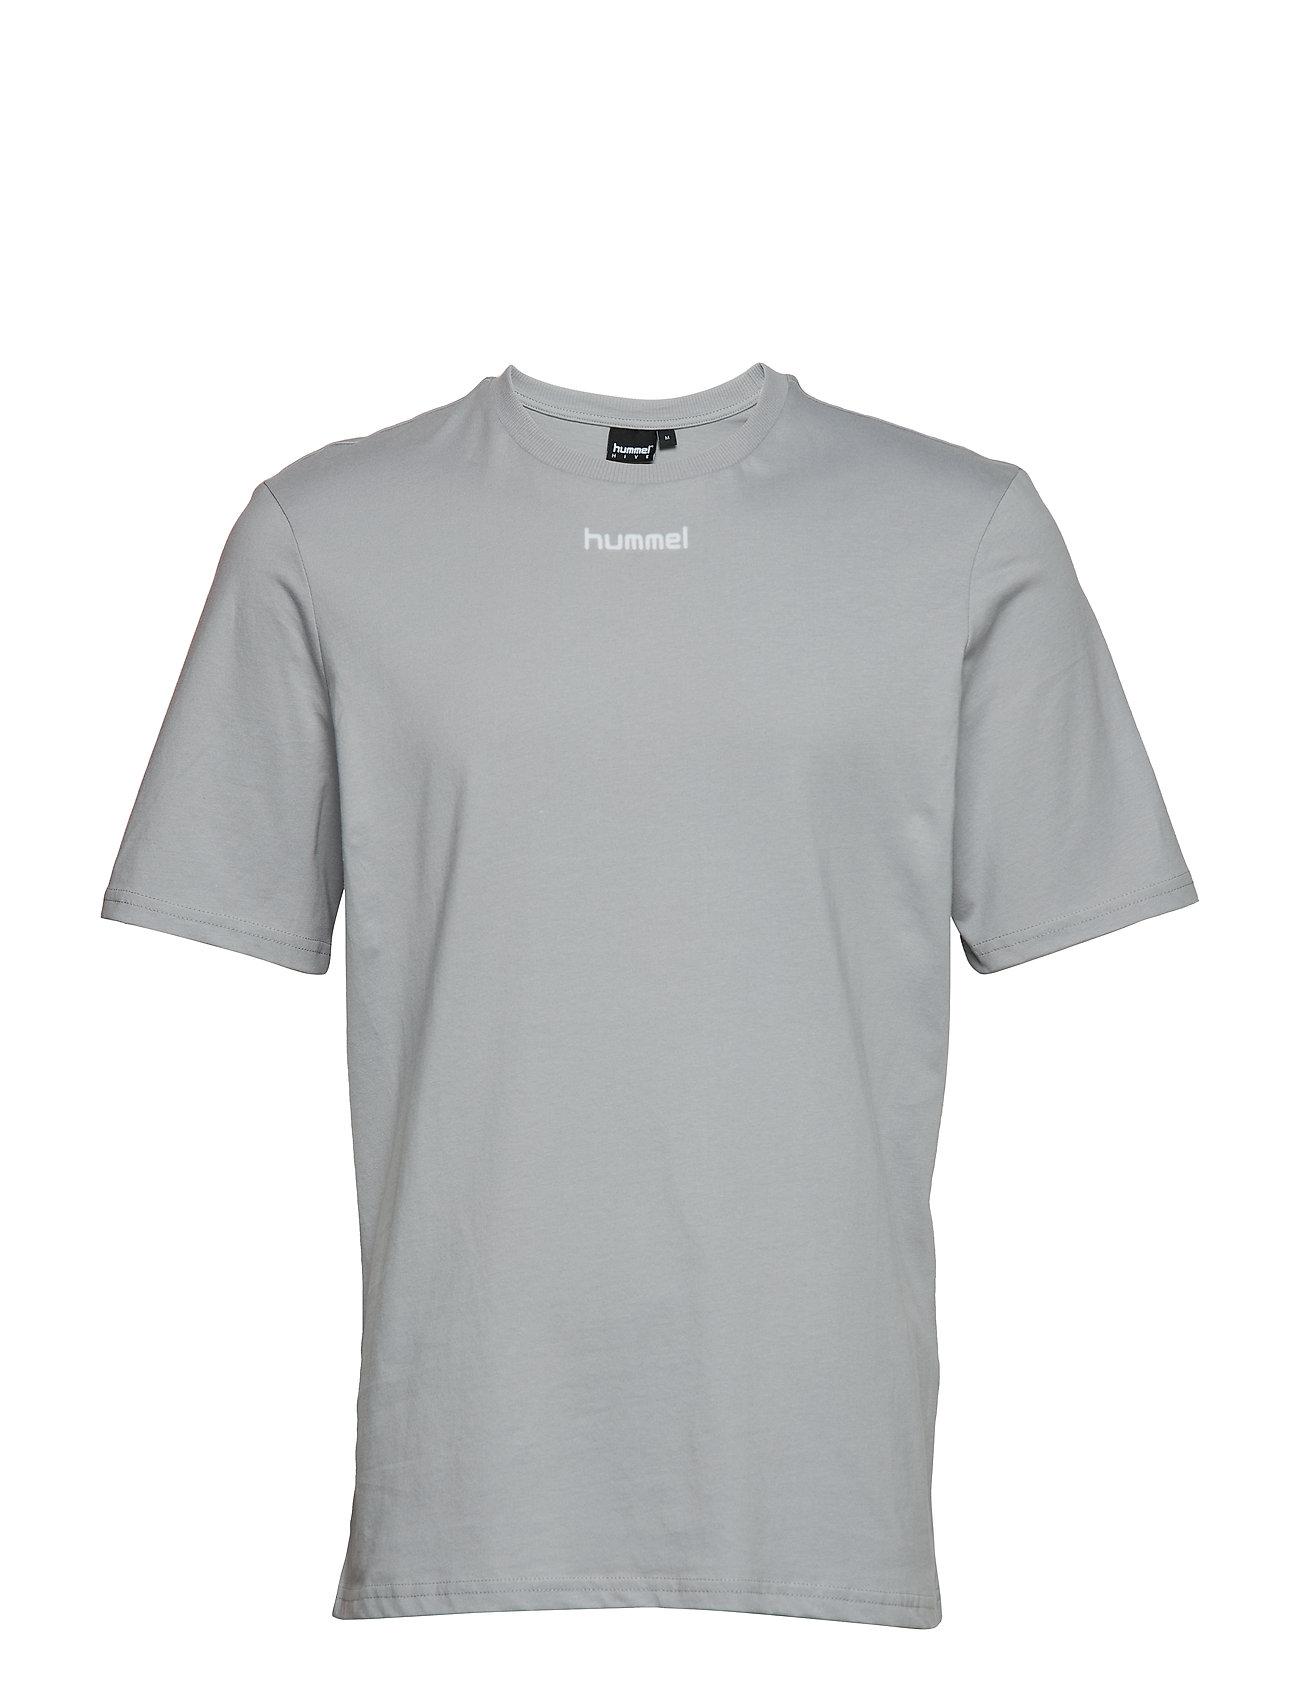 Hive shirt S Hmlalvar T salloyHummel sthrQdC